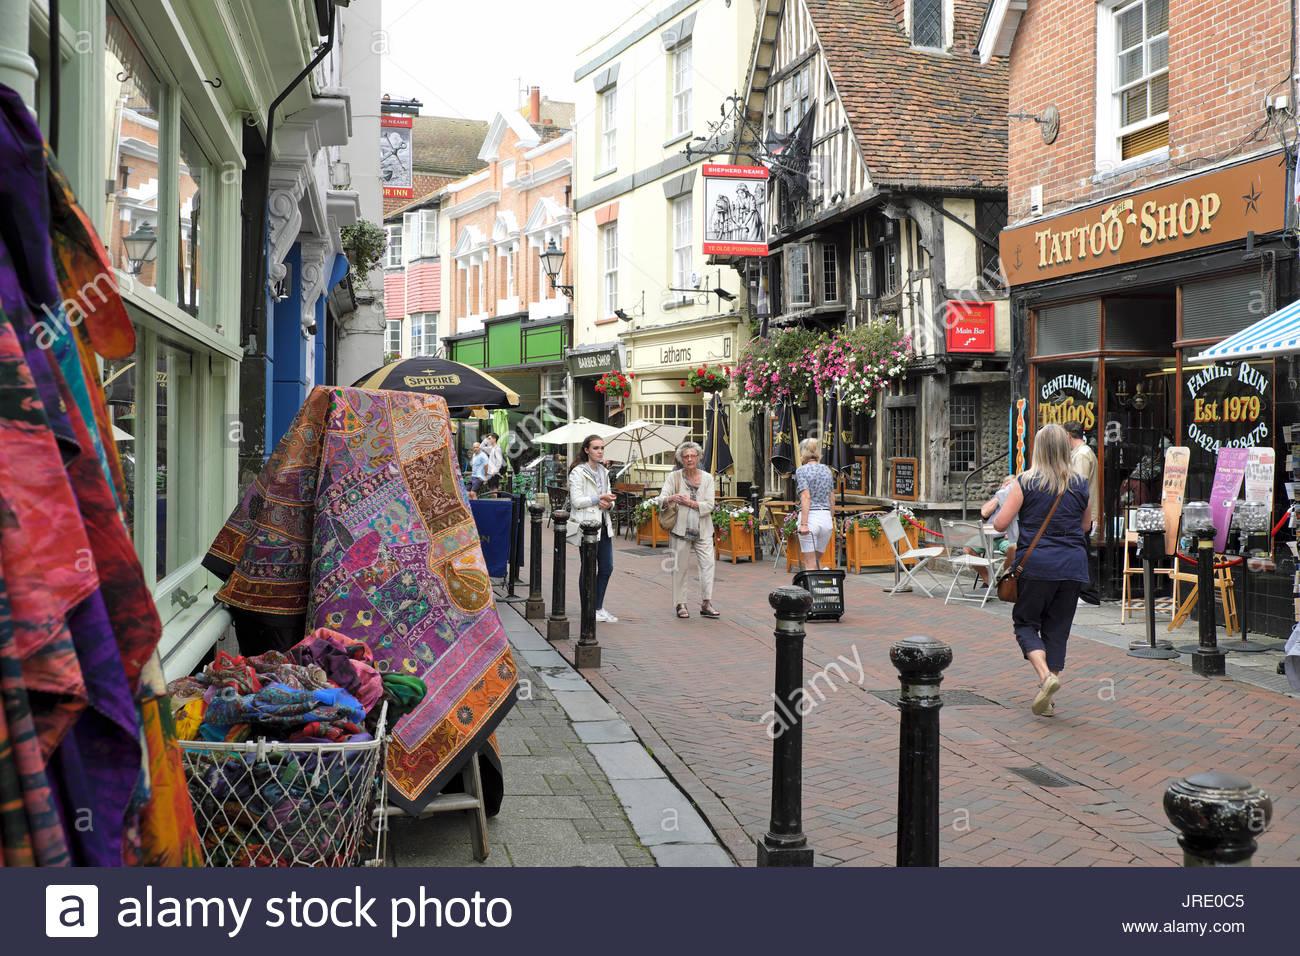 Retro Shop In Hastings Town Westhill Arcade George: George Street Hastings Shops Stock Photos & George Street